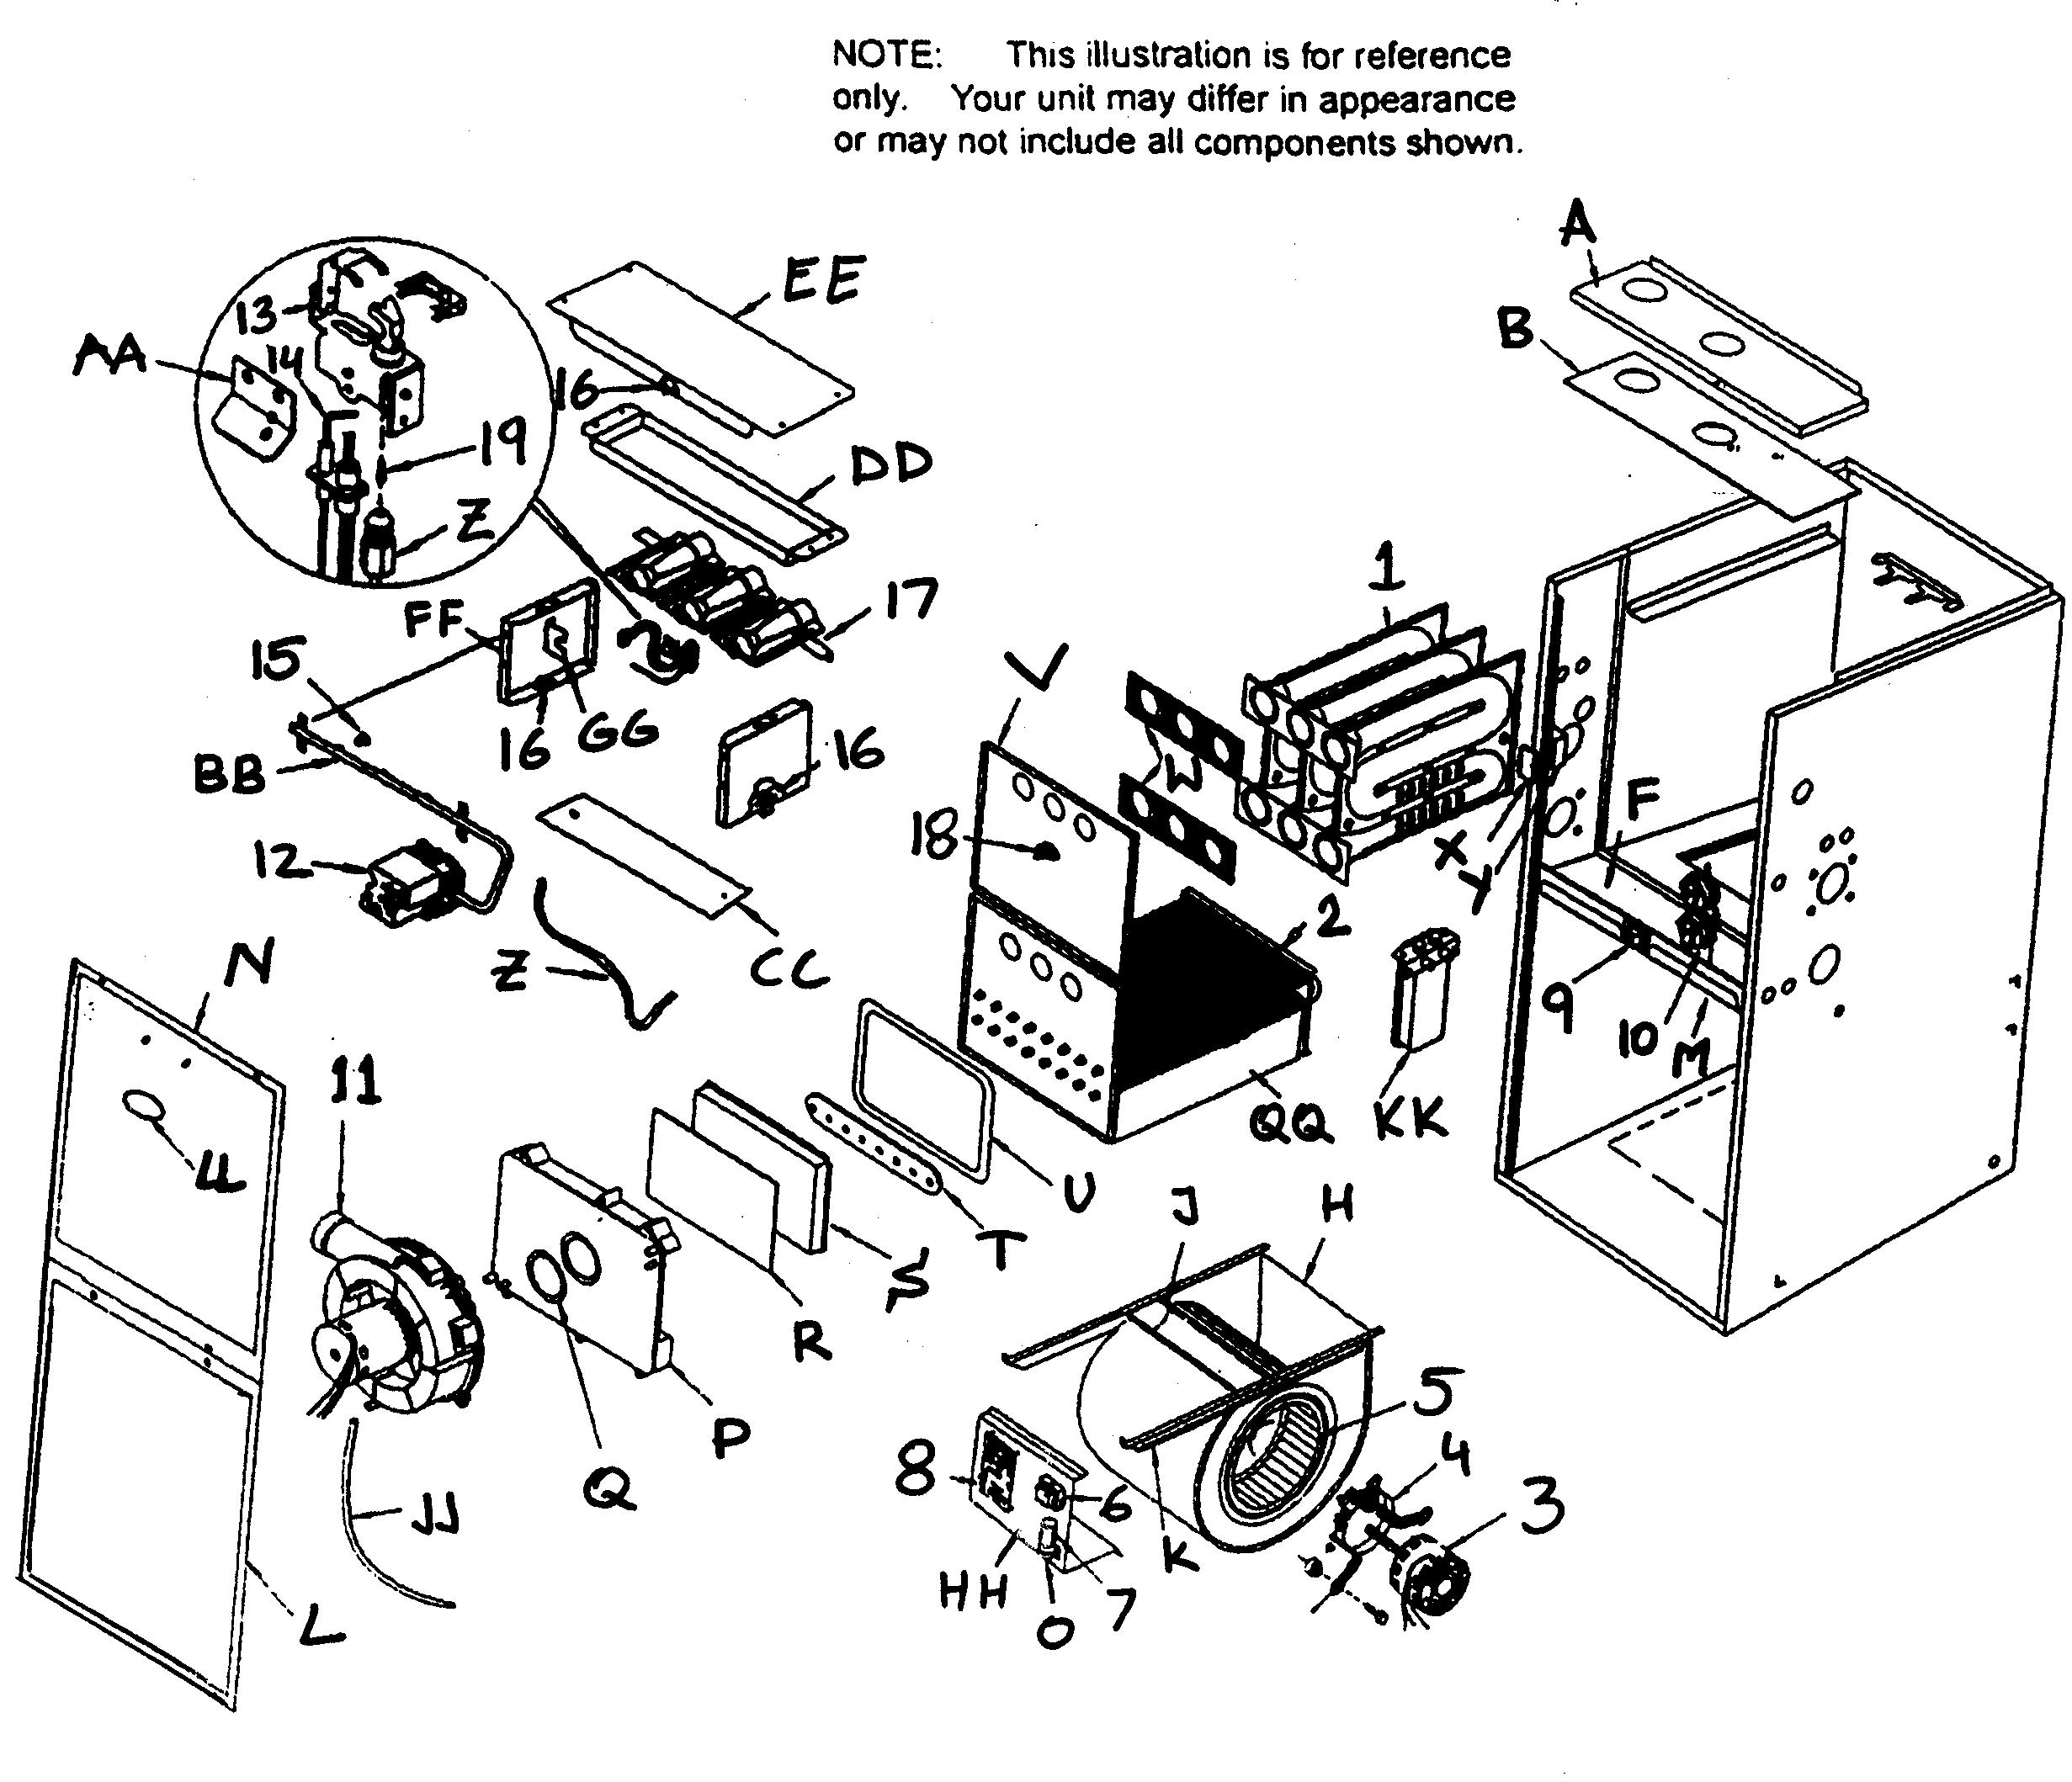 FO_4152] Wiring Model Tempstar Diagram Nrgf60Db04 Schematic WiringPneu Mecad Gho Emba Mohammedshrine Librar Wiring 101